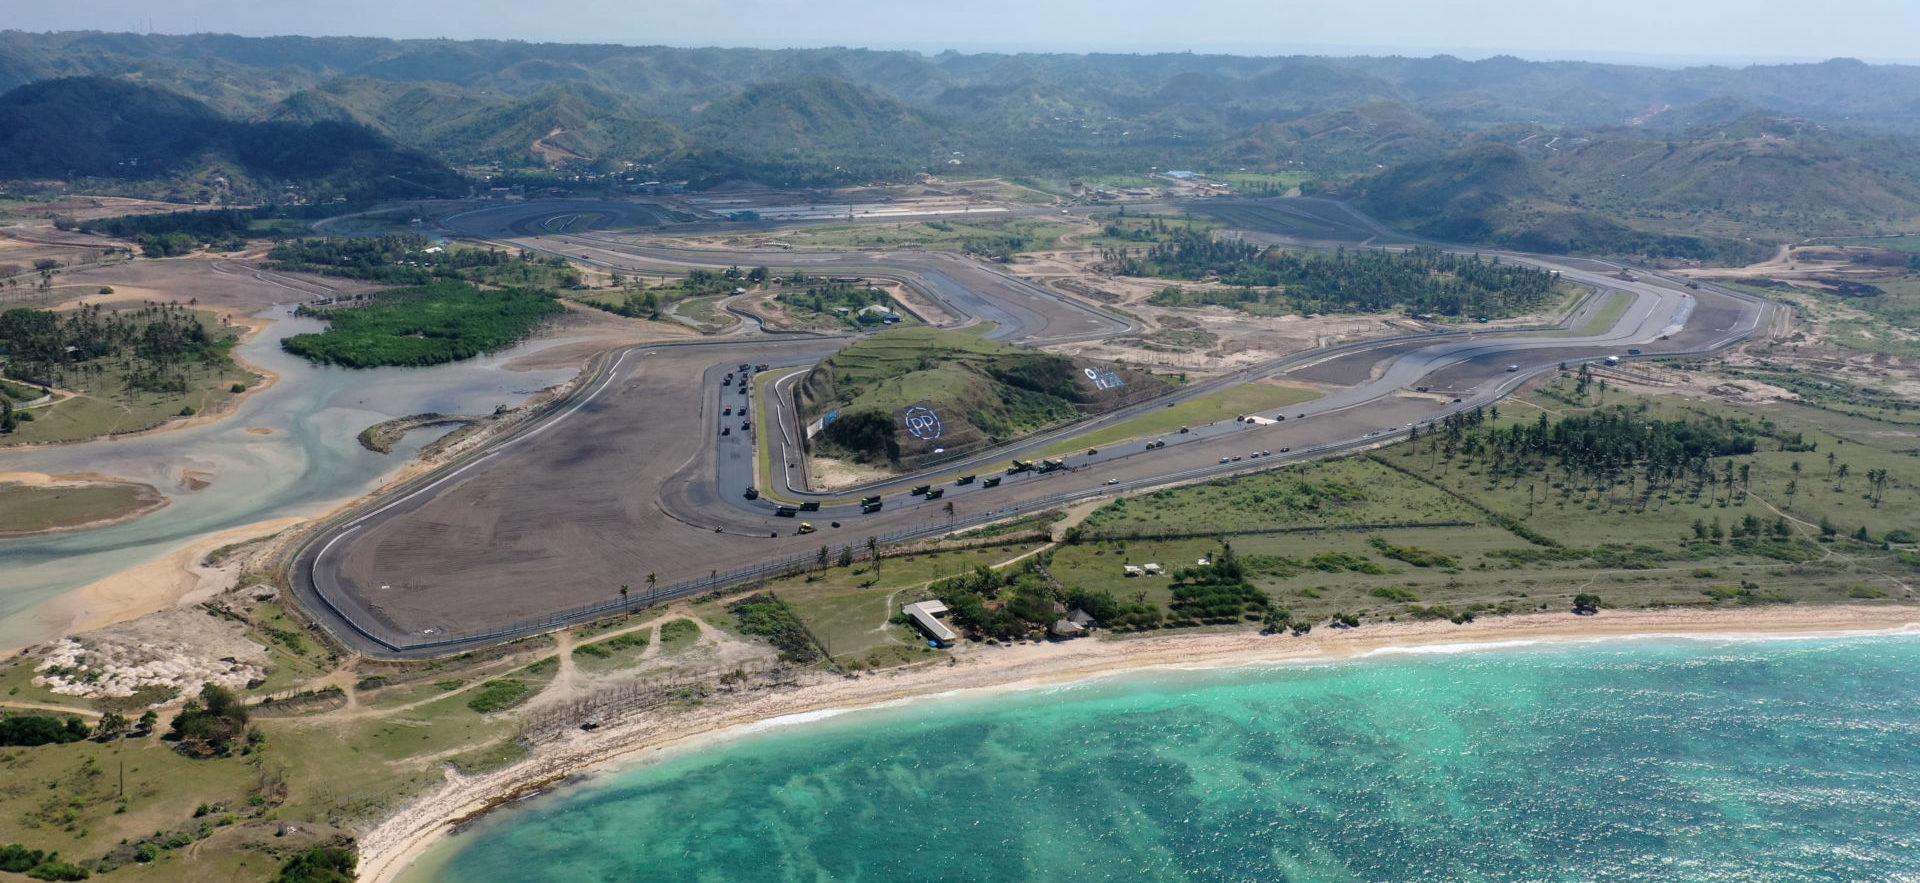 The Mandalika International Street Circuit under construction in Indonesia. Photo courtesy Dorna.